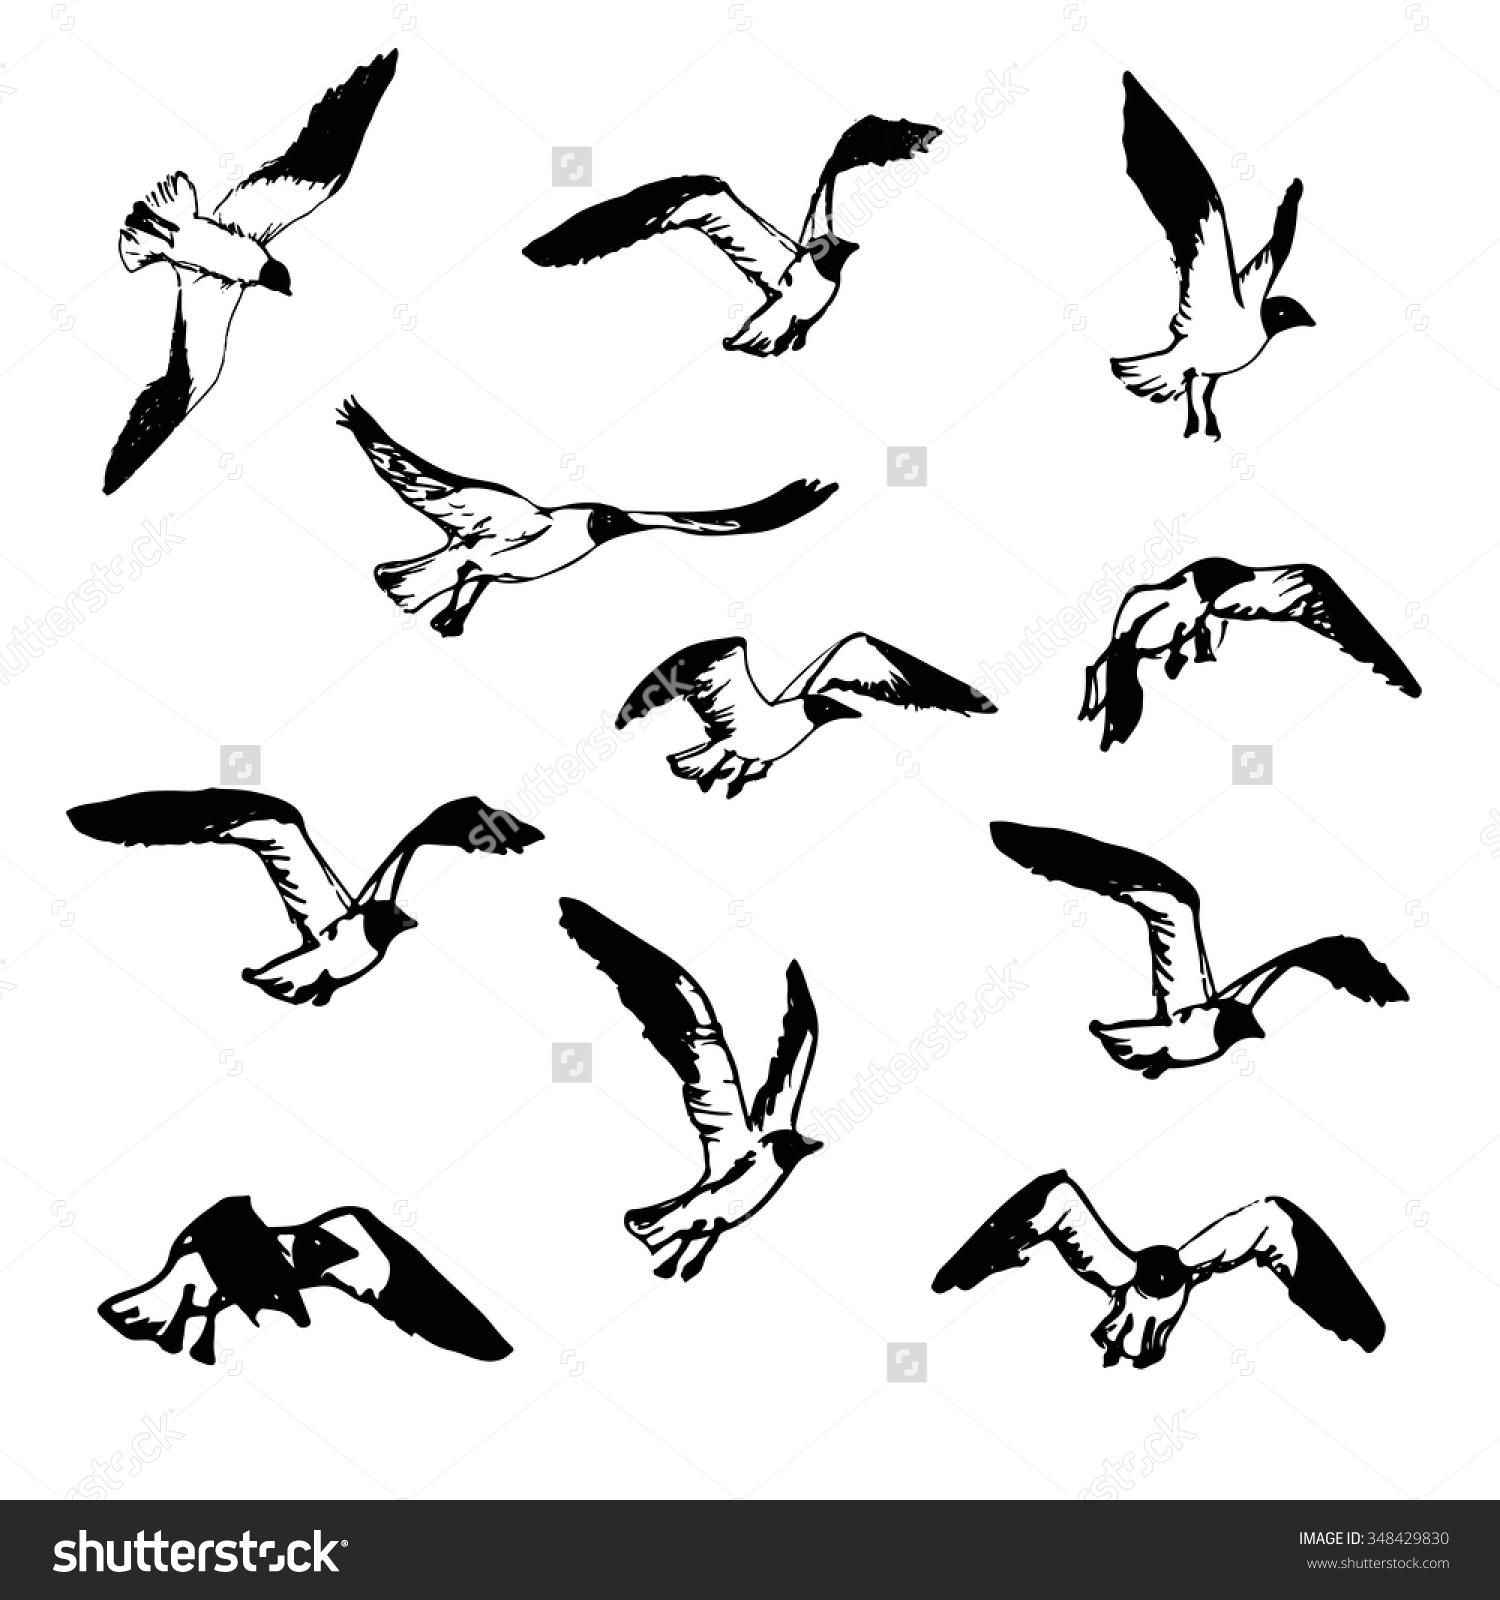 1500x1600 Drawings Of Birds In Flight Flying Bird Drawing Free Download